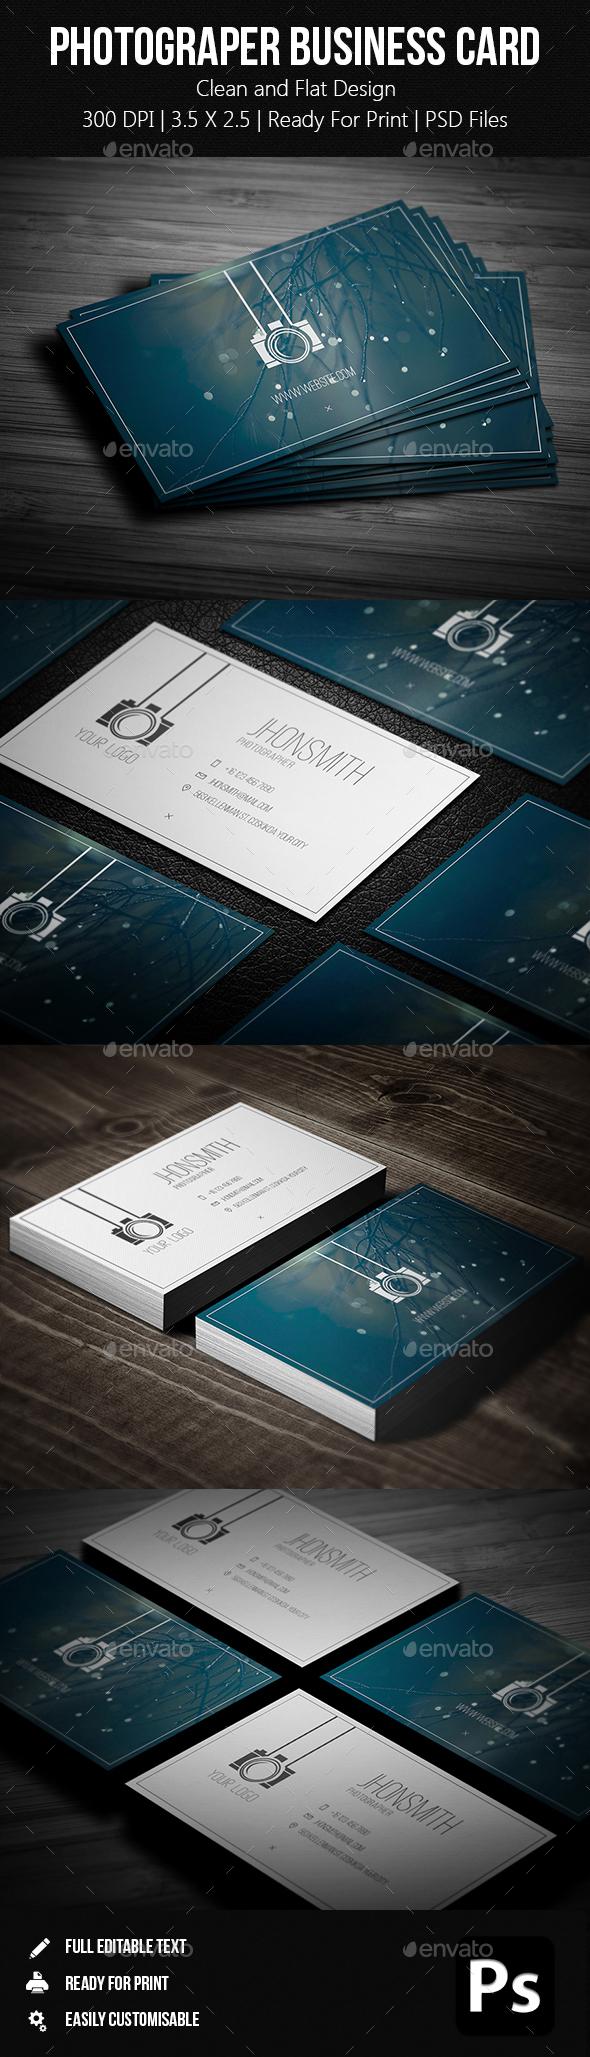 Creative Photgrapher Business Card 05 - Creative Business Cards